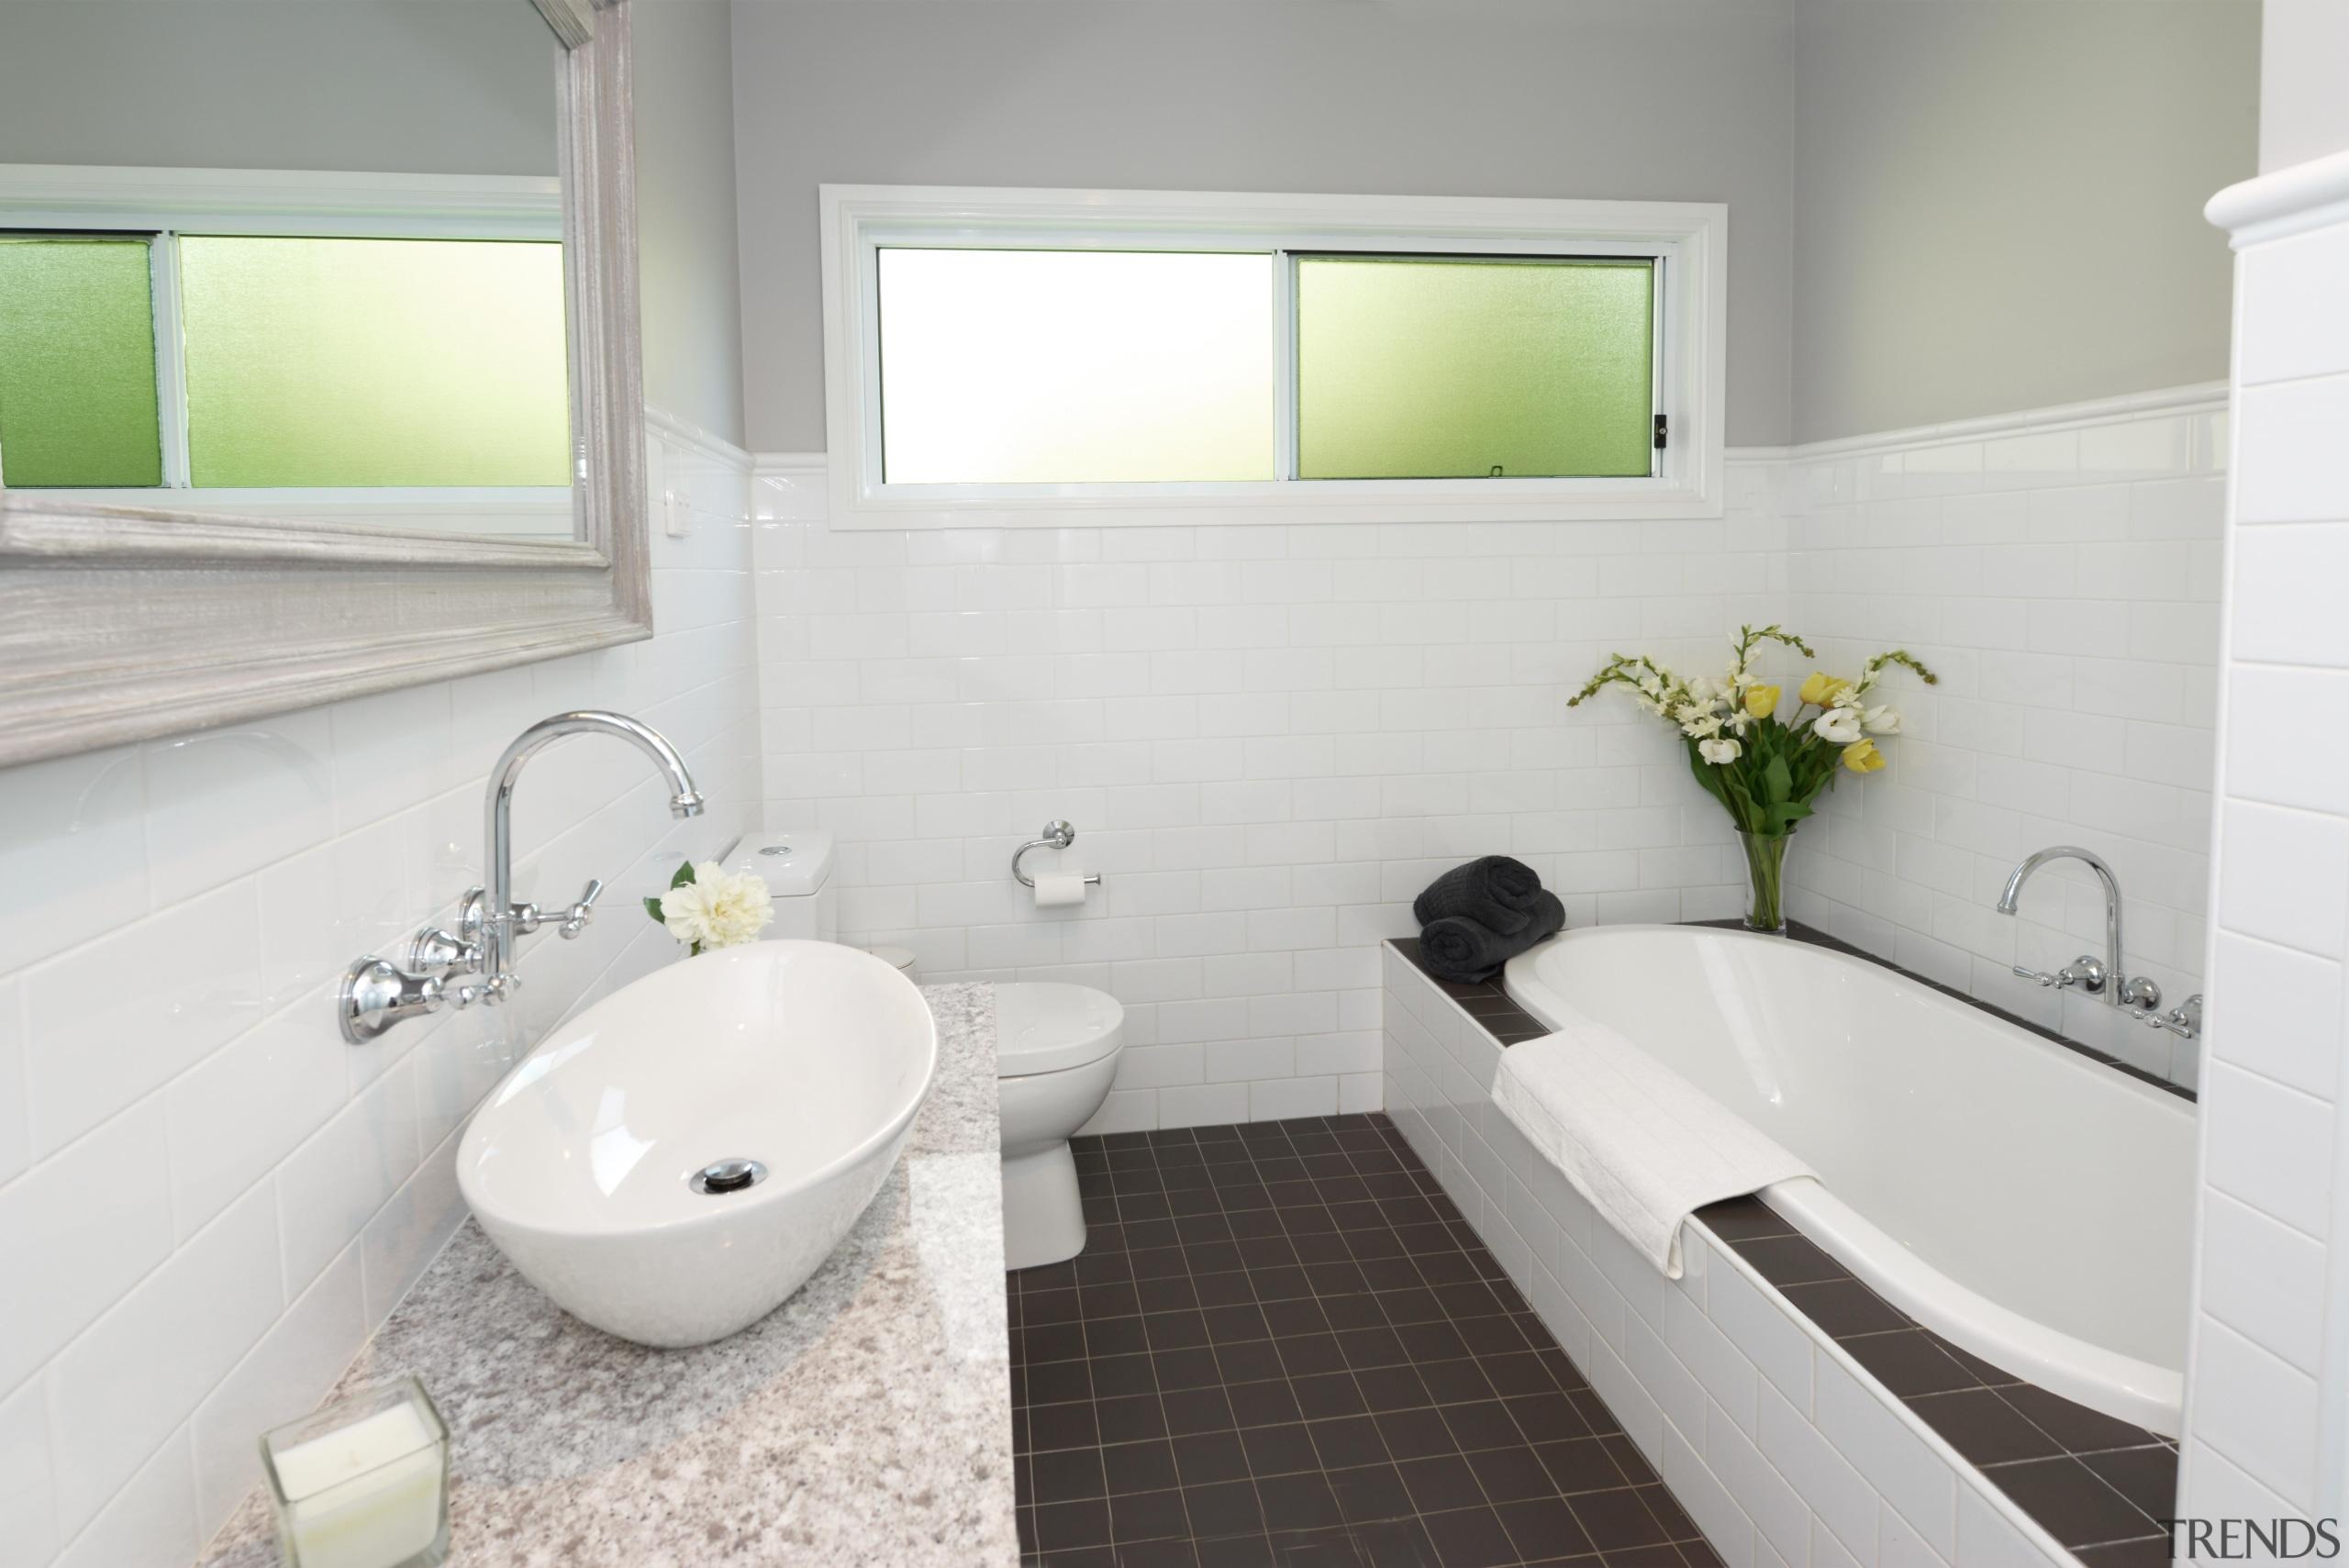 4338.jpg - bathroom   bathroom accessory   bidet bathroom, bathroom accessory, bidet, floor, home, interior design, plumbing fixture, product design, room, sink, tap, tile, toilet seat, wall, white